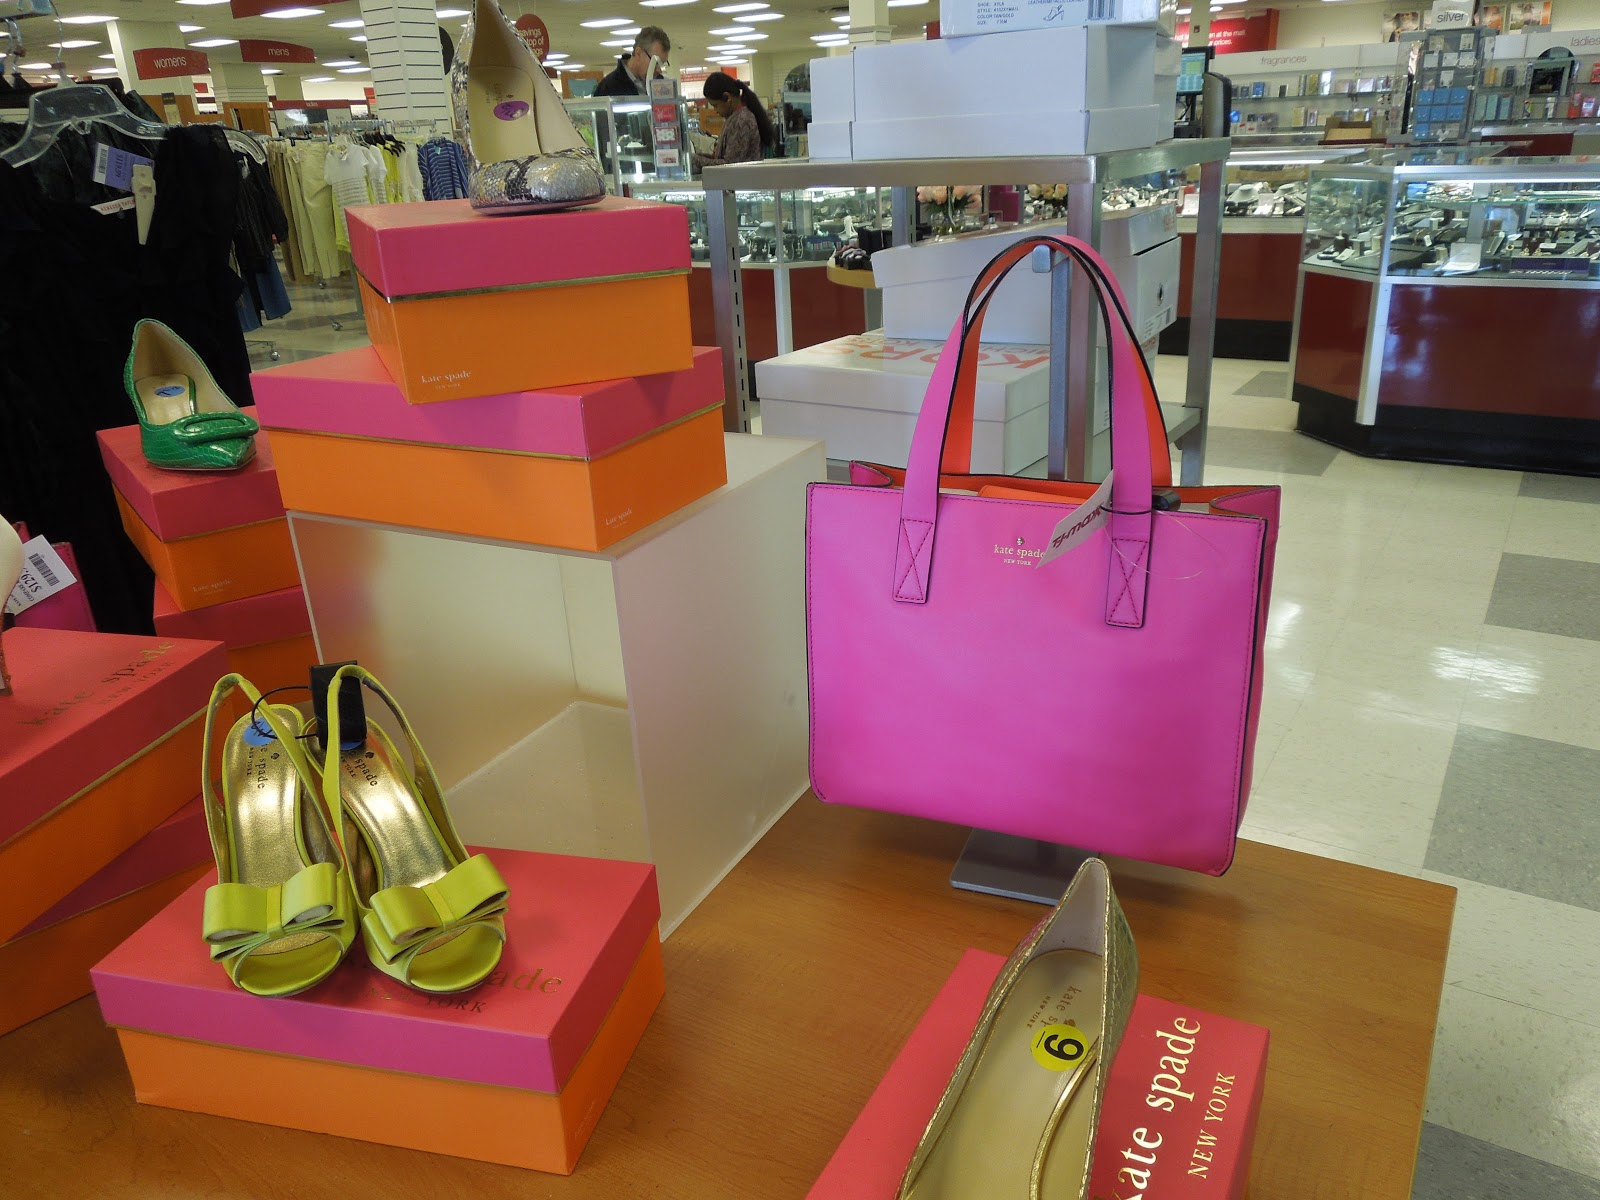 fc0855f78c99 No Rebecca for a Year: Shopping Temptations: TJ Maxx